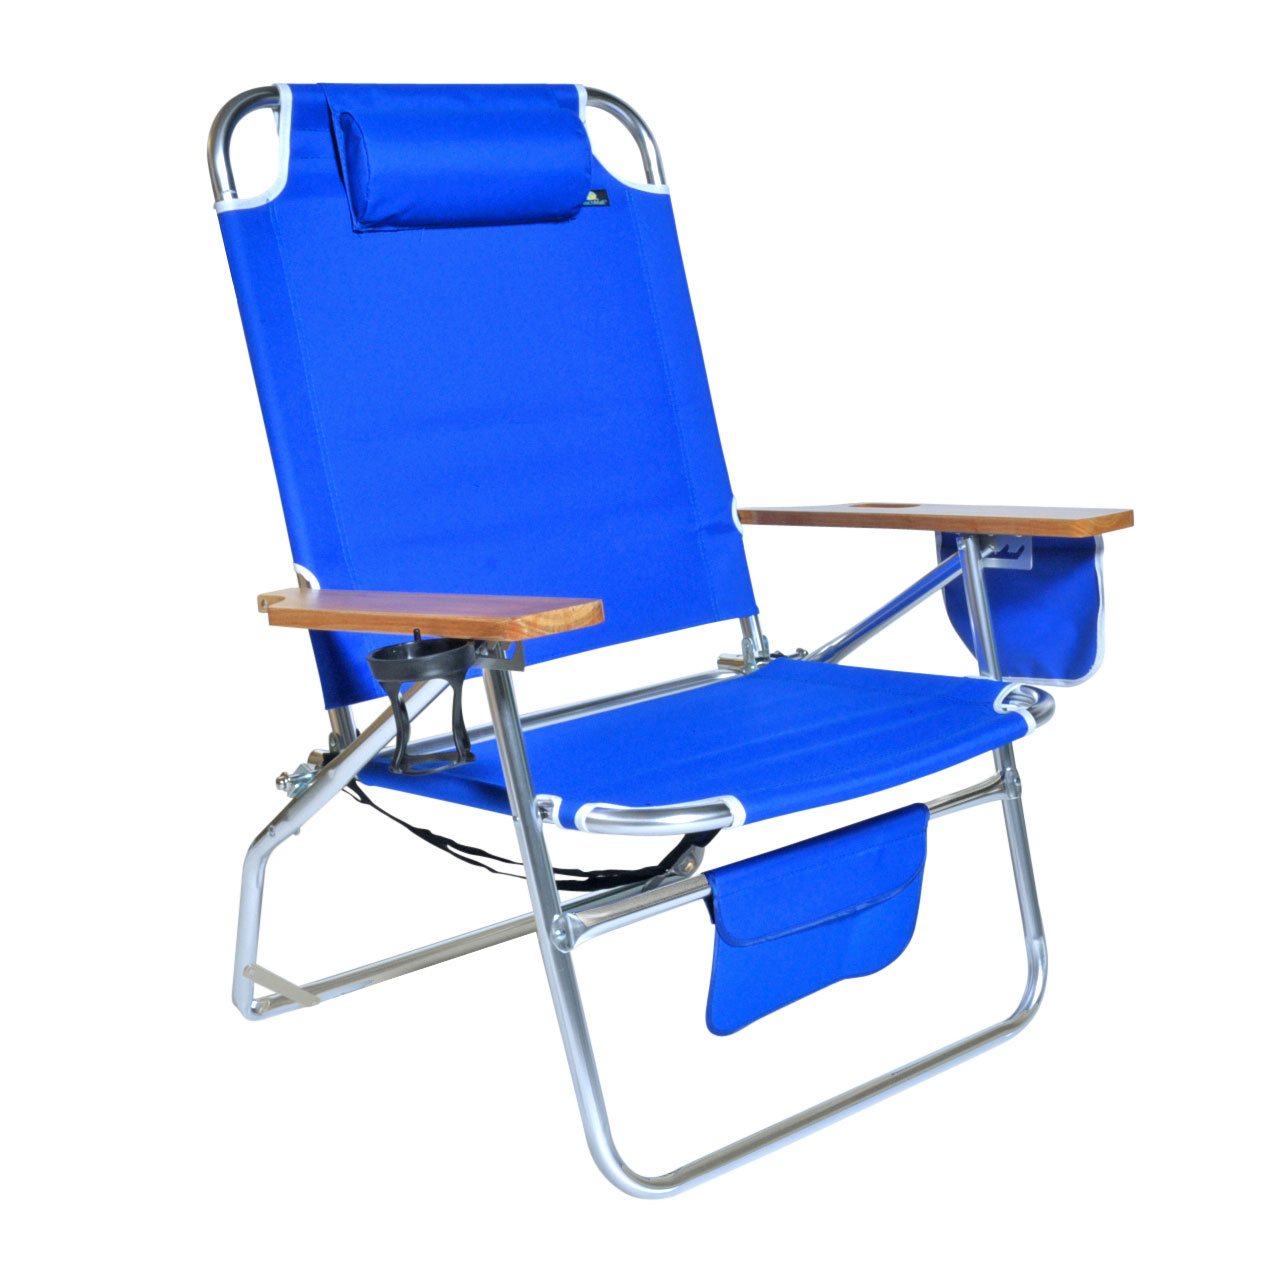 big and tall outdoor chairs 500lbs fishing chair with headrest jumbo heavy duty 500 lbs xl aluminum beach for walmart com